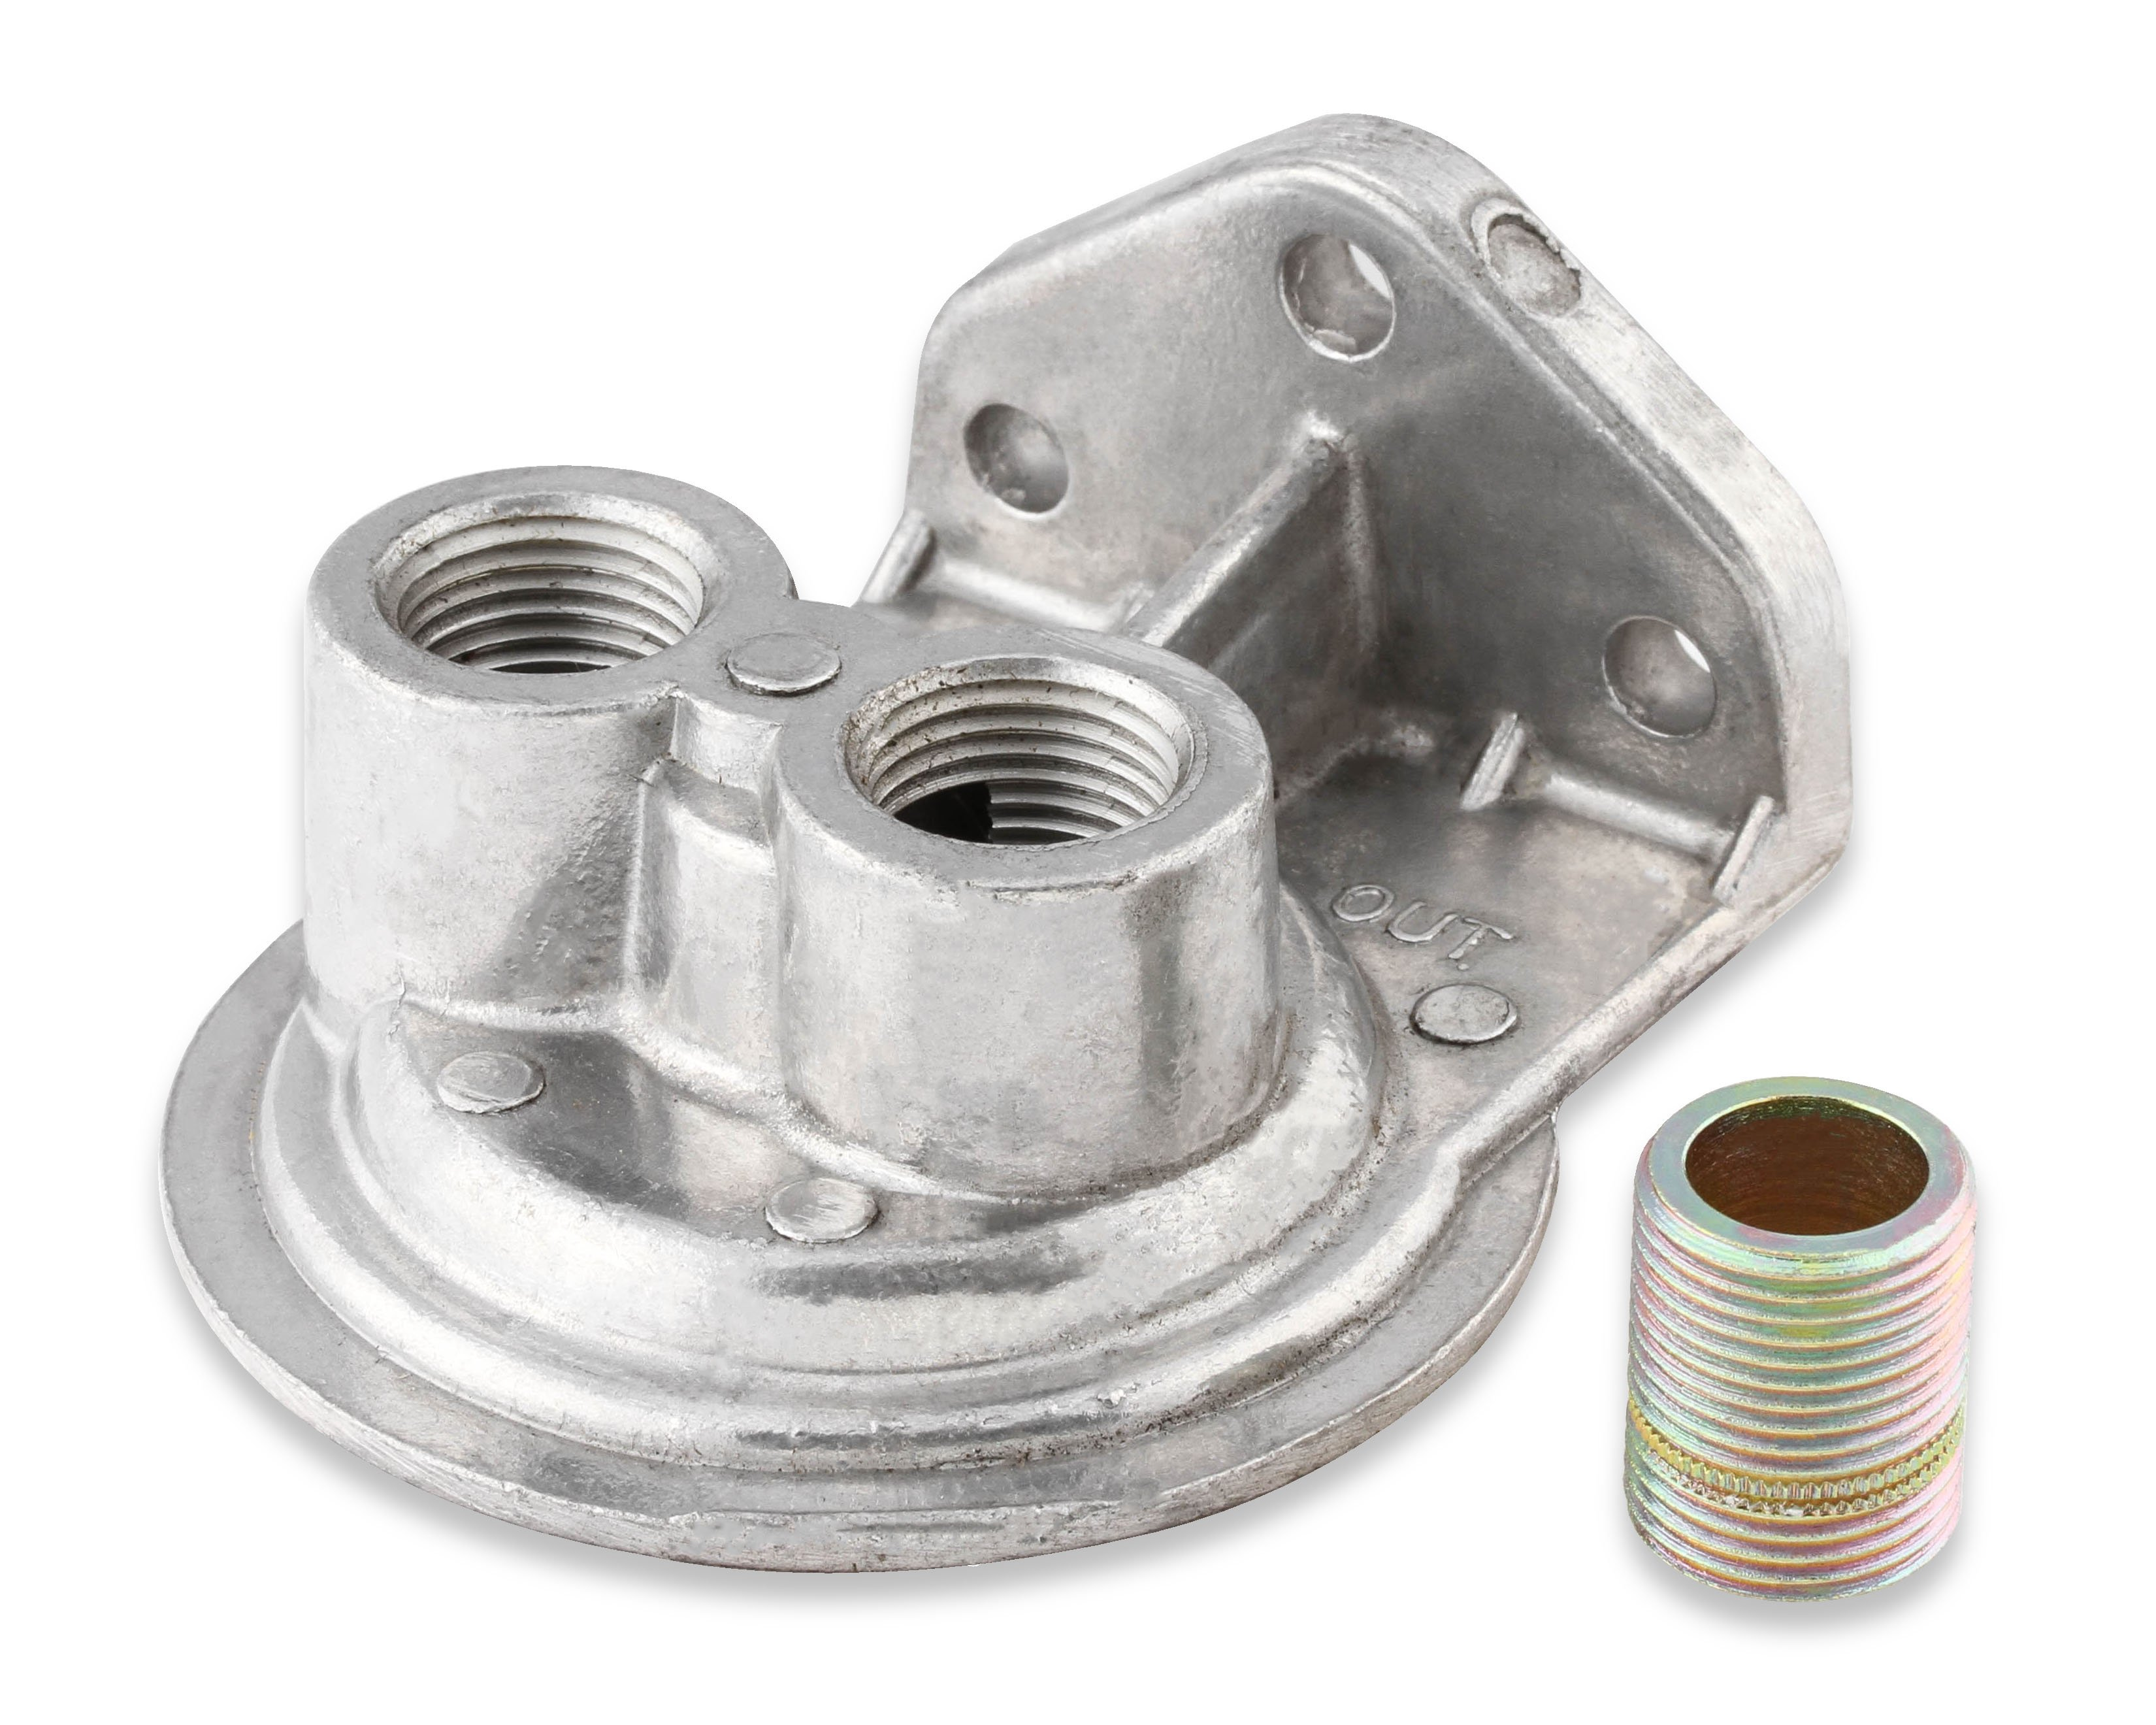 earls 2177erl earls cast remote oil filter mount kit